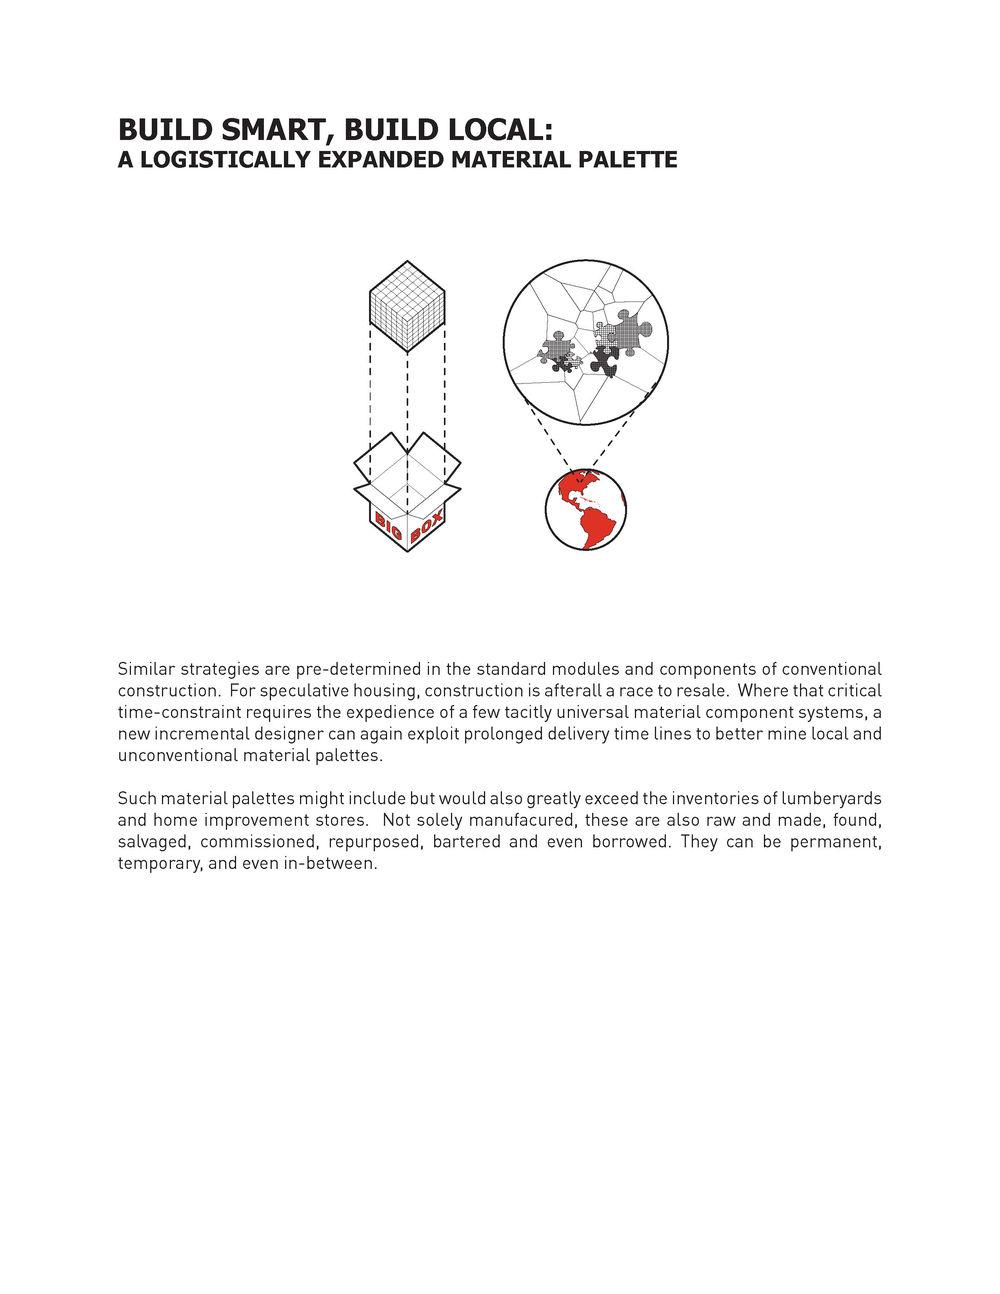 DSA_CMiller_Thesis_Slides_Boards_03_30_2013_Page_10.jpg